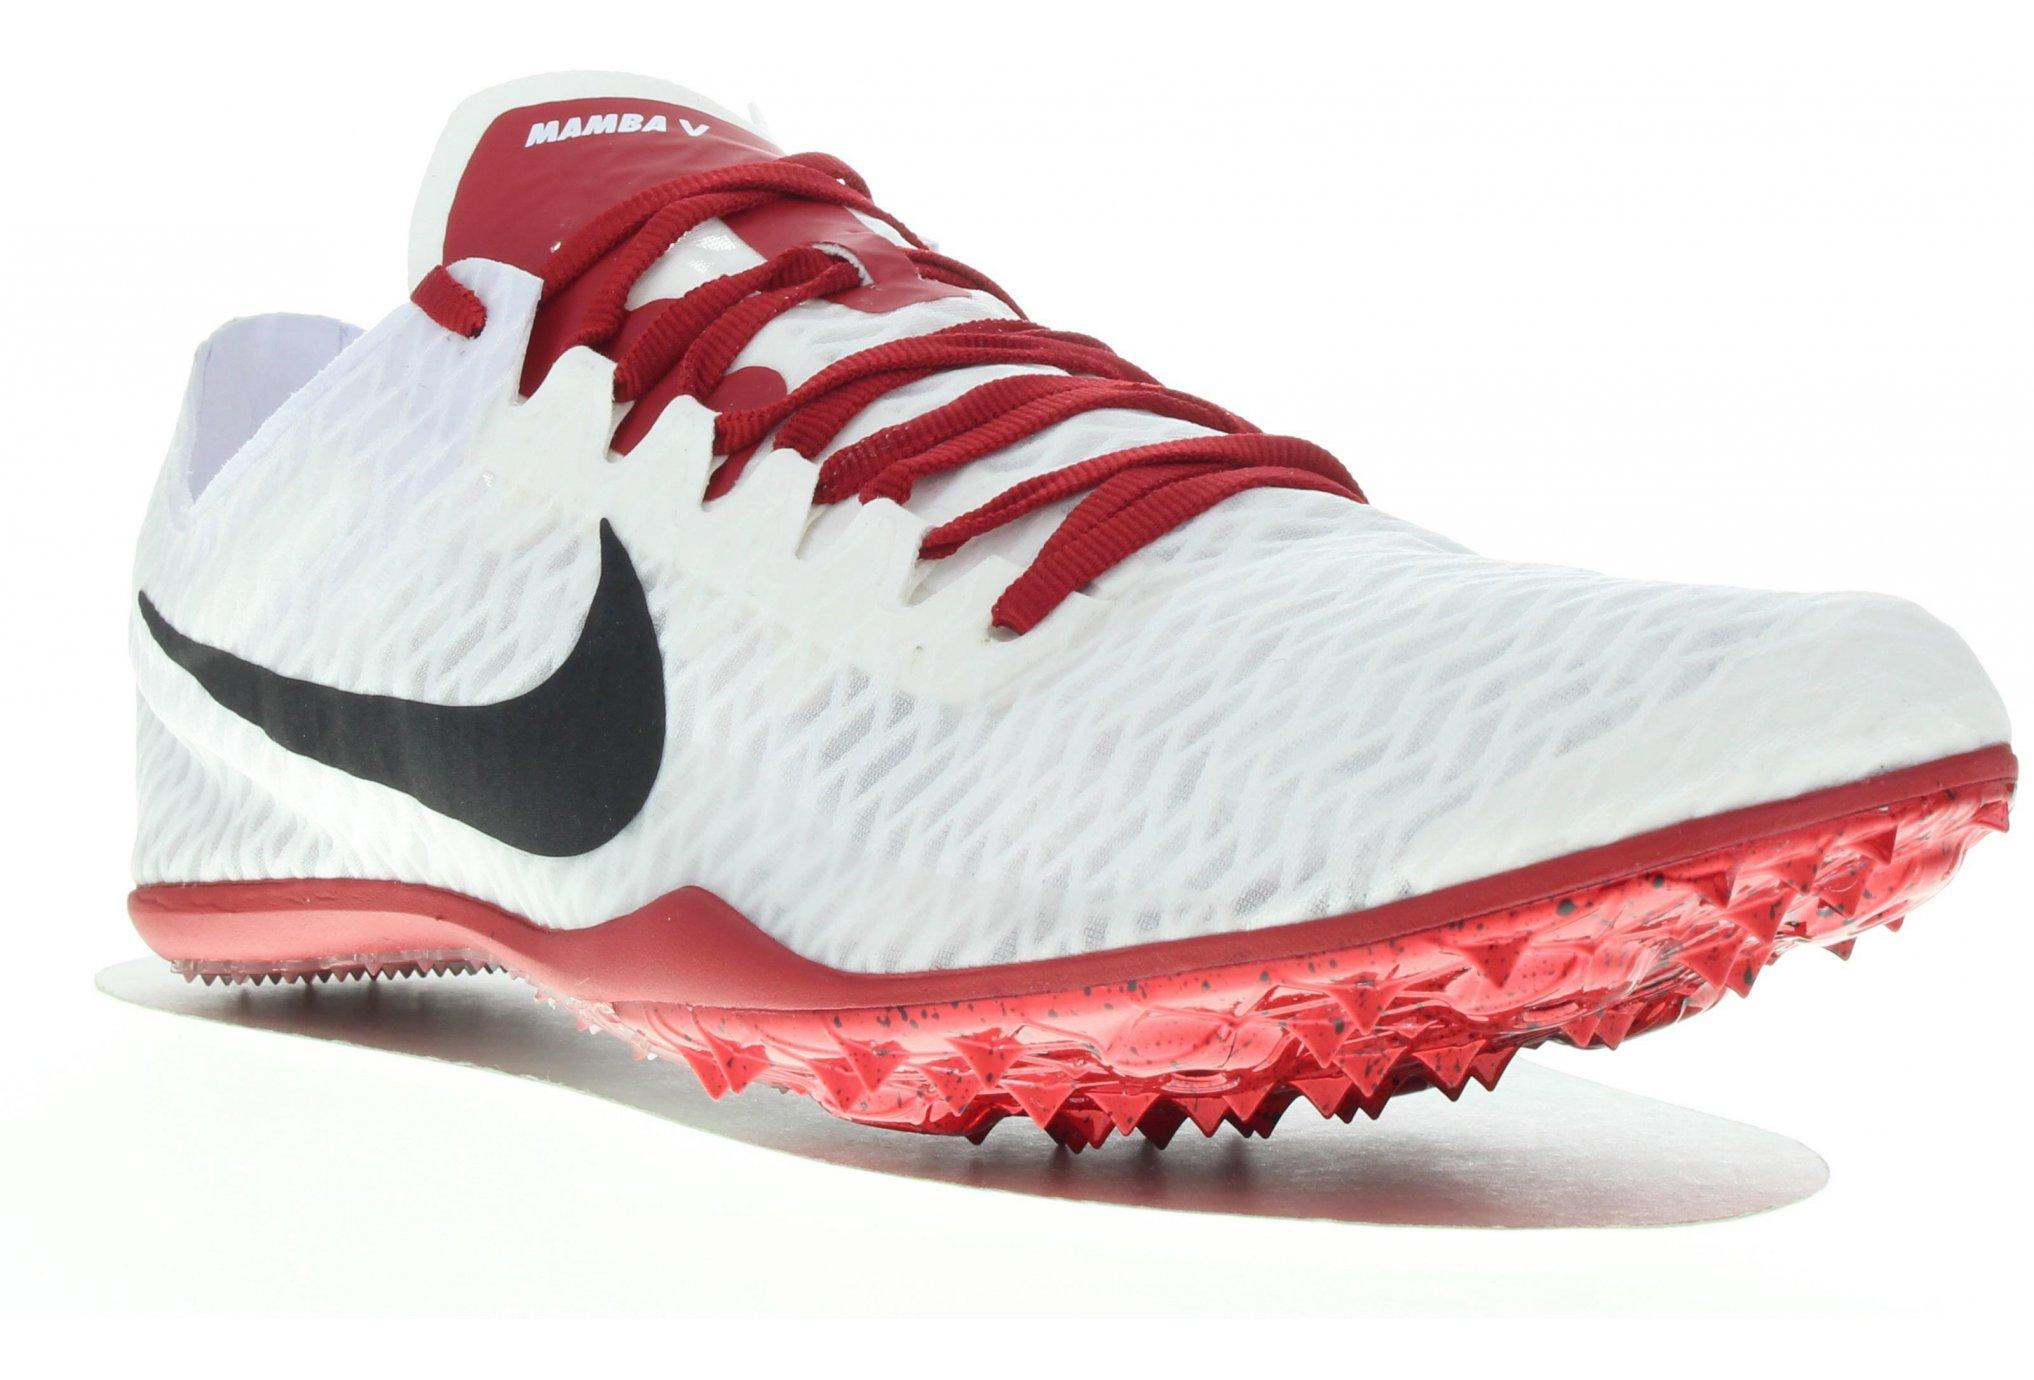 Nike Zoom Mamba 5 Bowerman Track Club M Chaussures homme